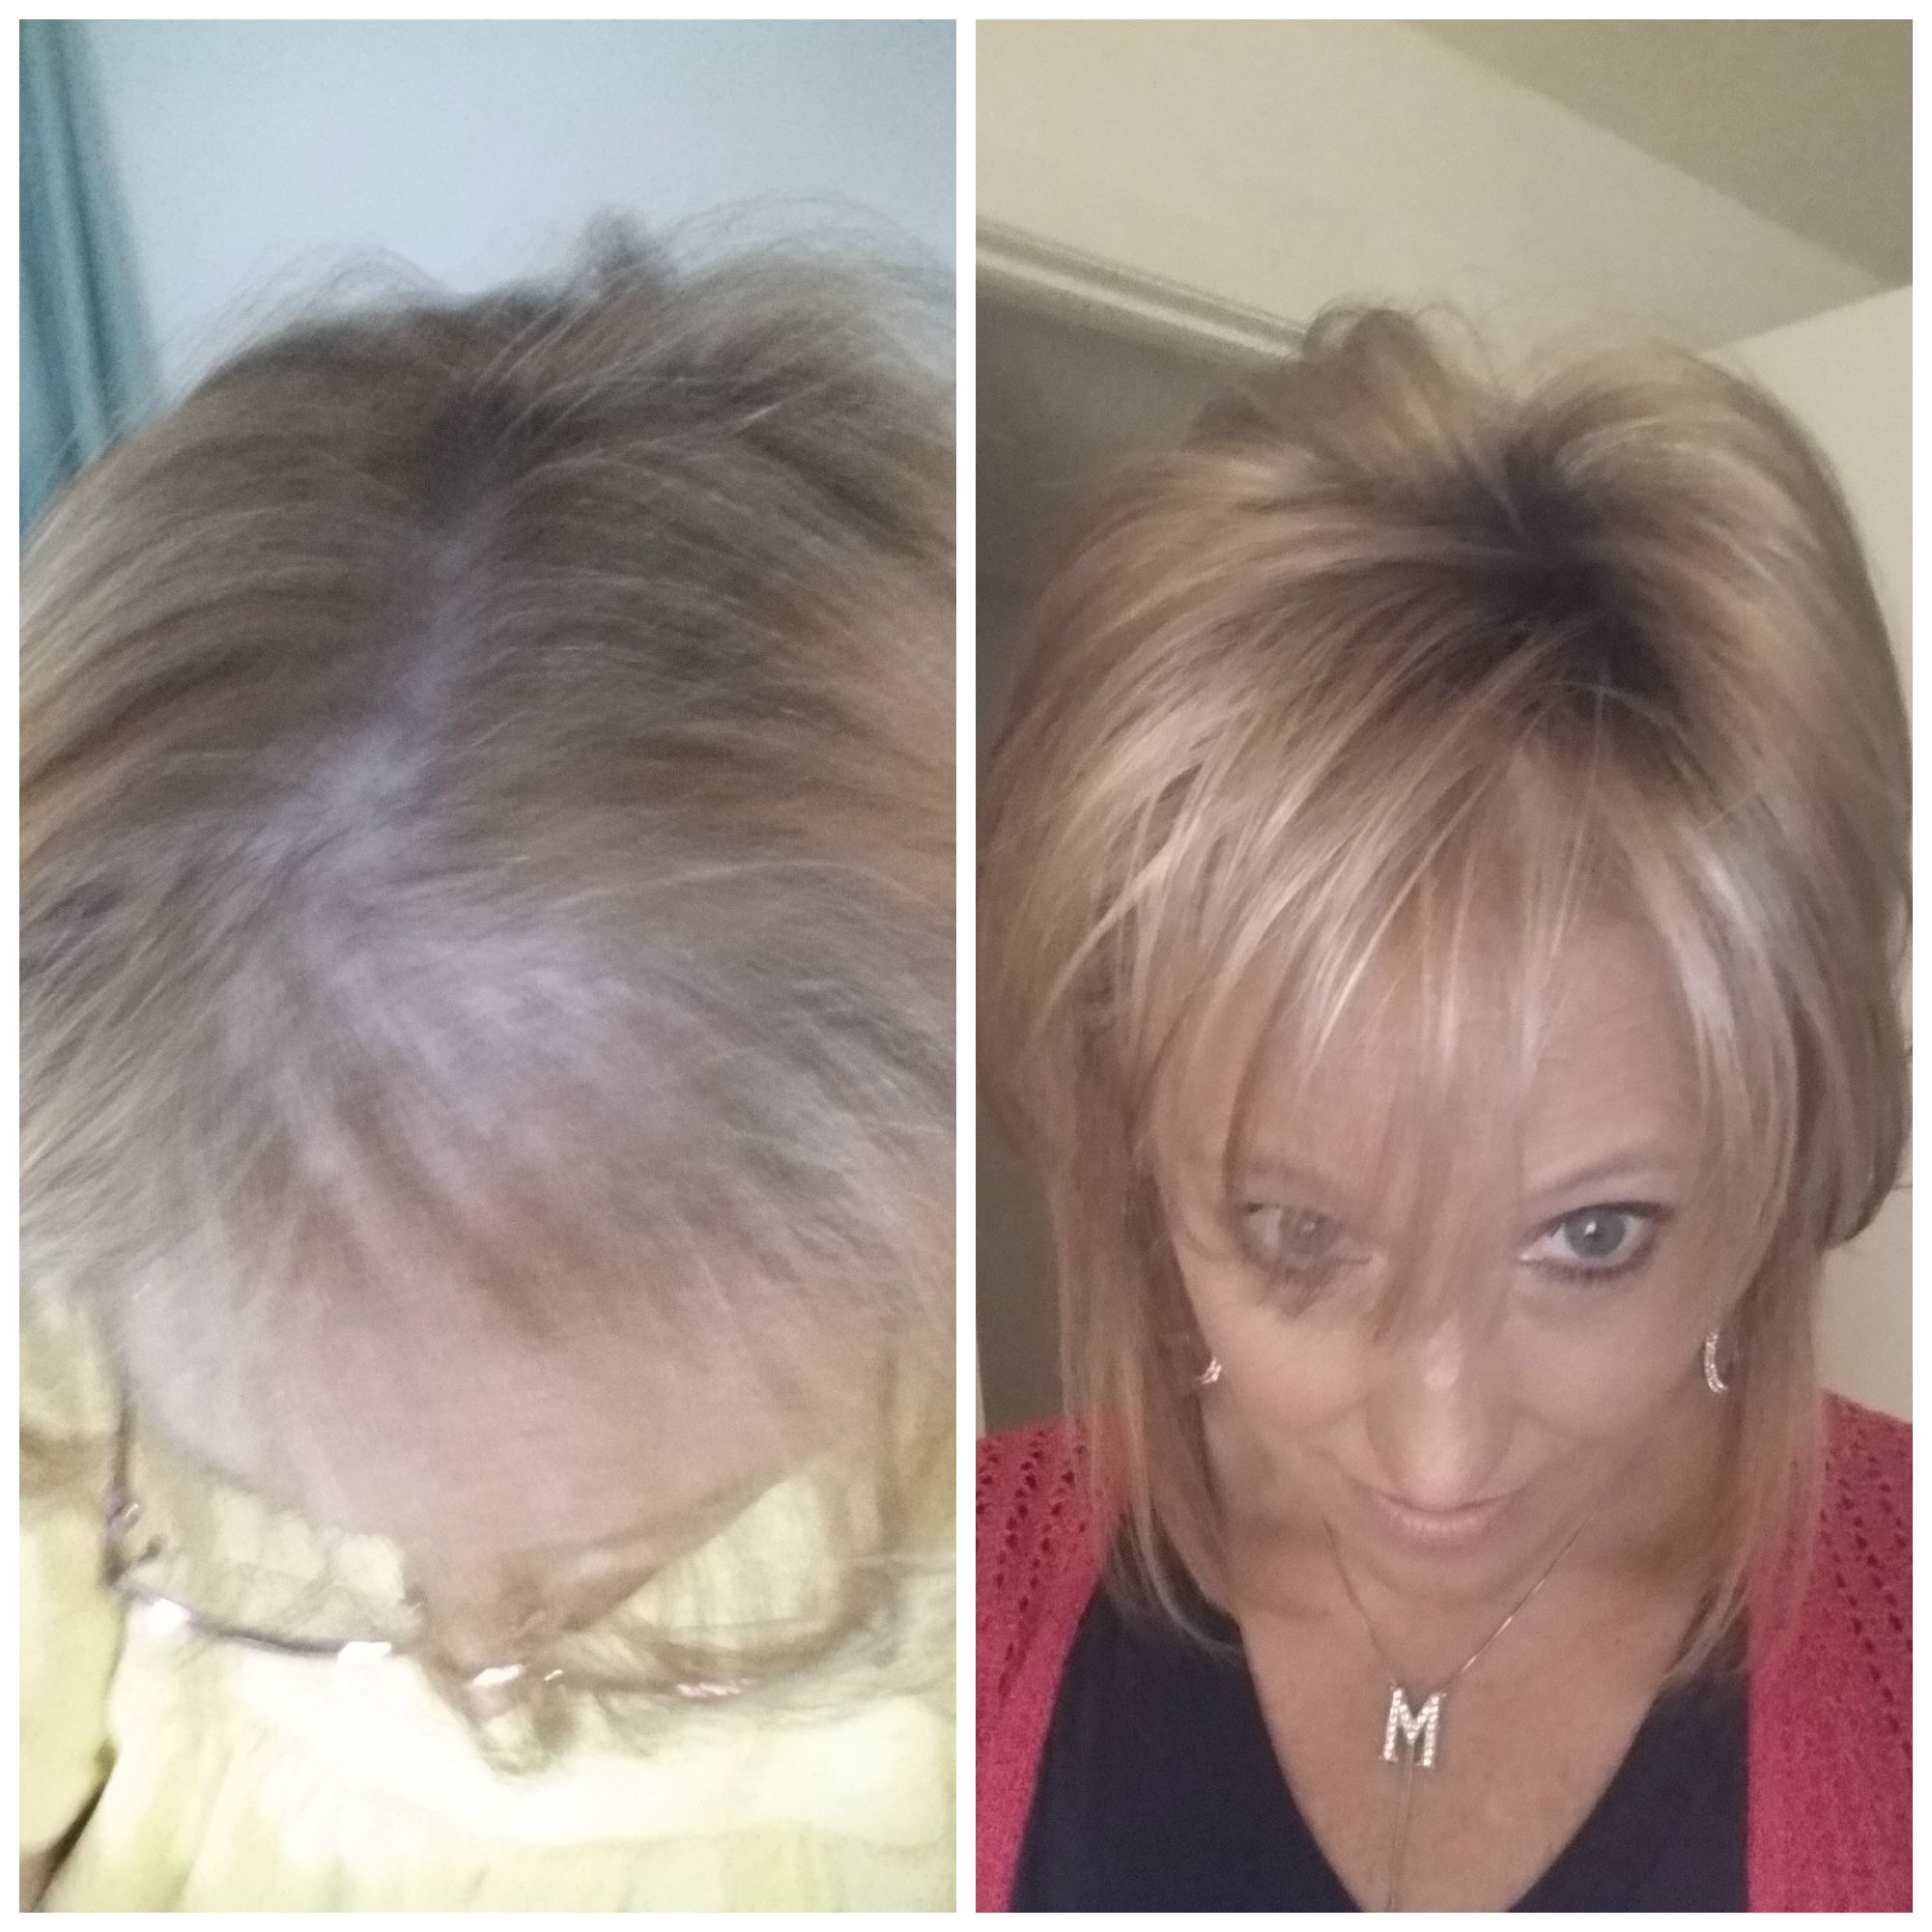 Medium Top w/ Roots Wearing Medium Top w/ Roots in